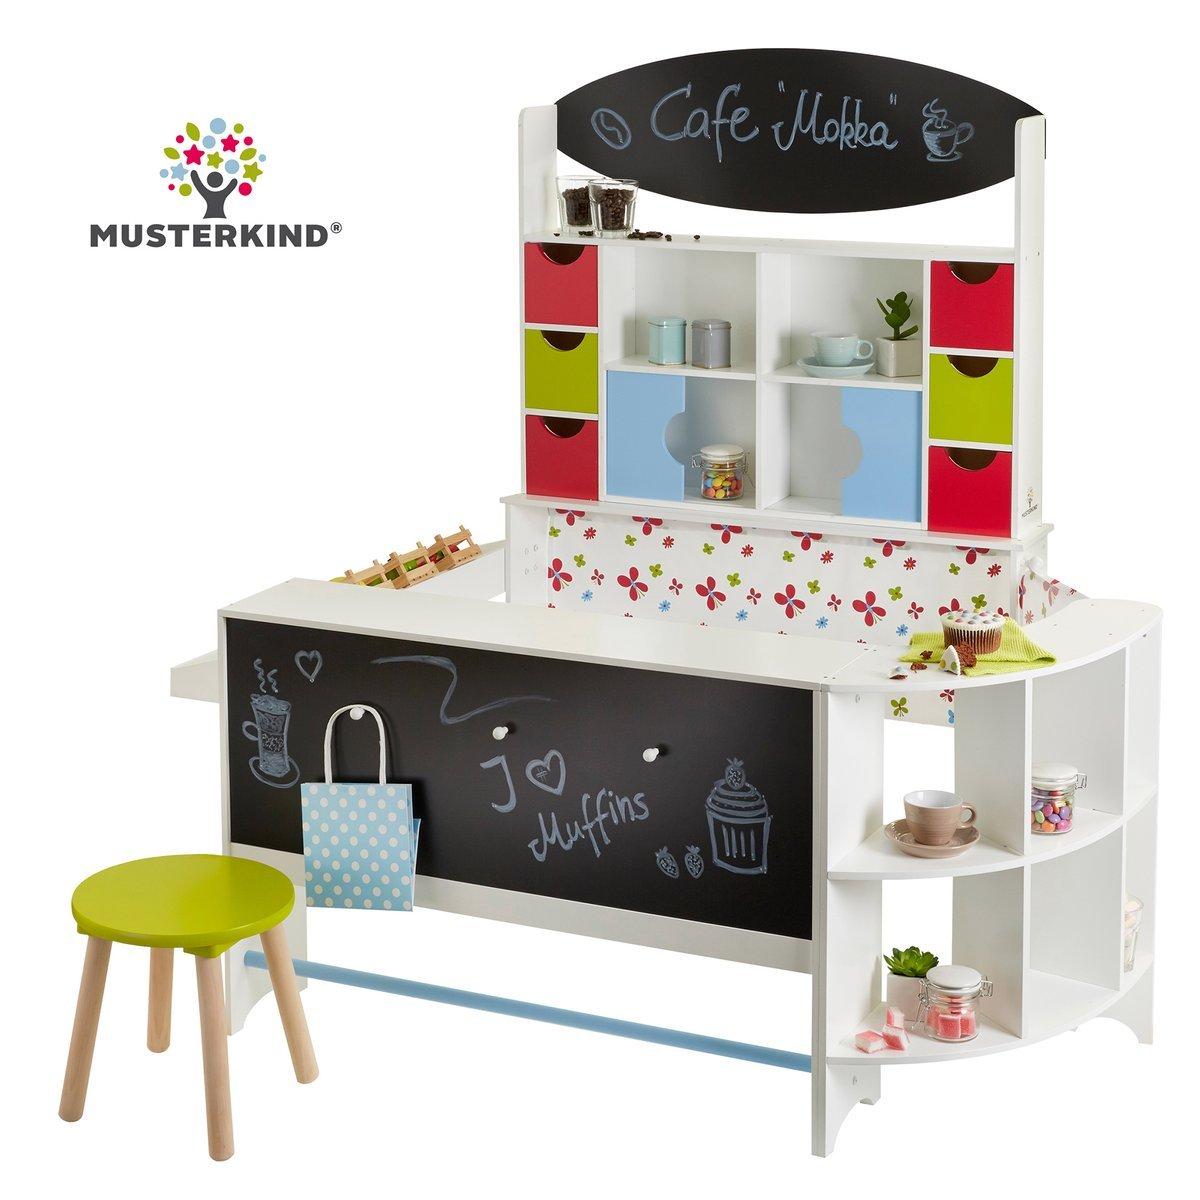 Musterkind Kaufmannsladen Cafe